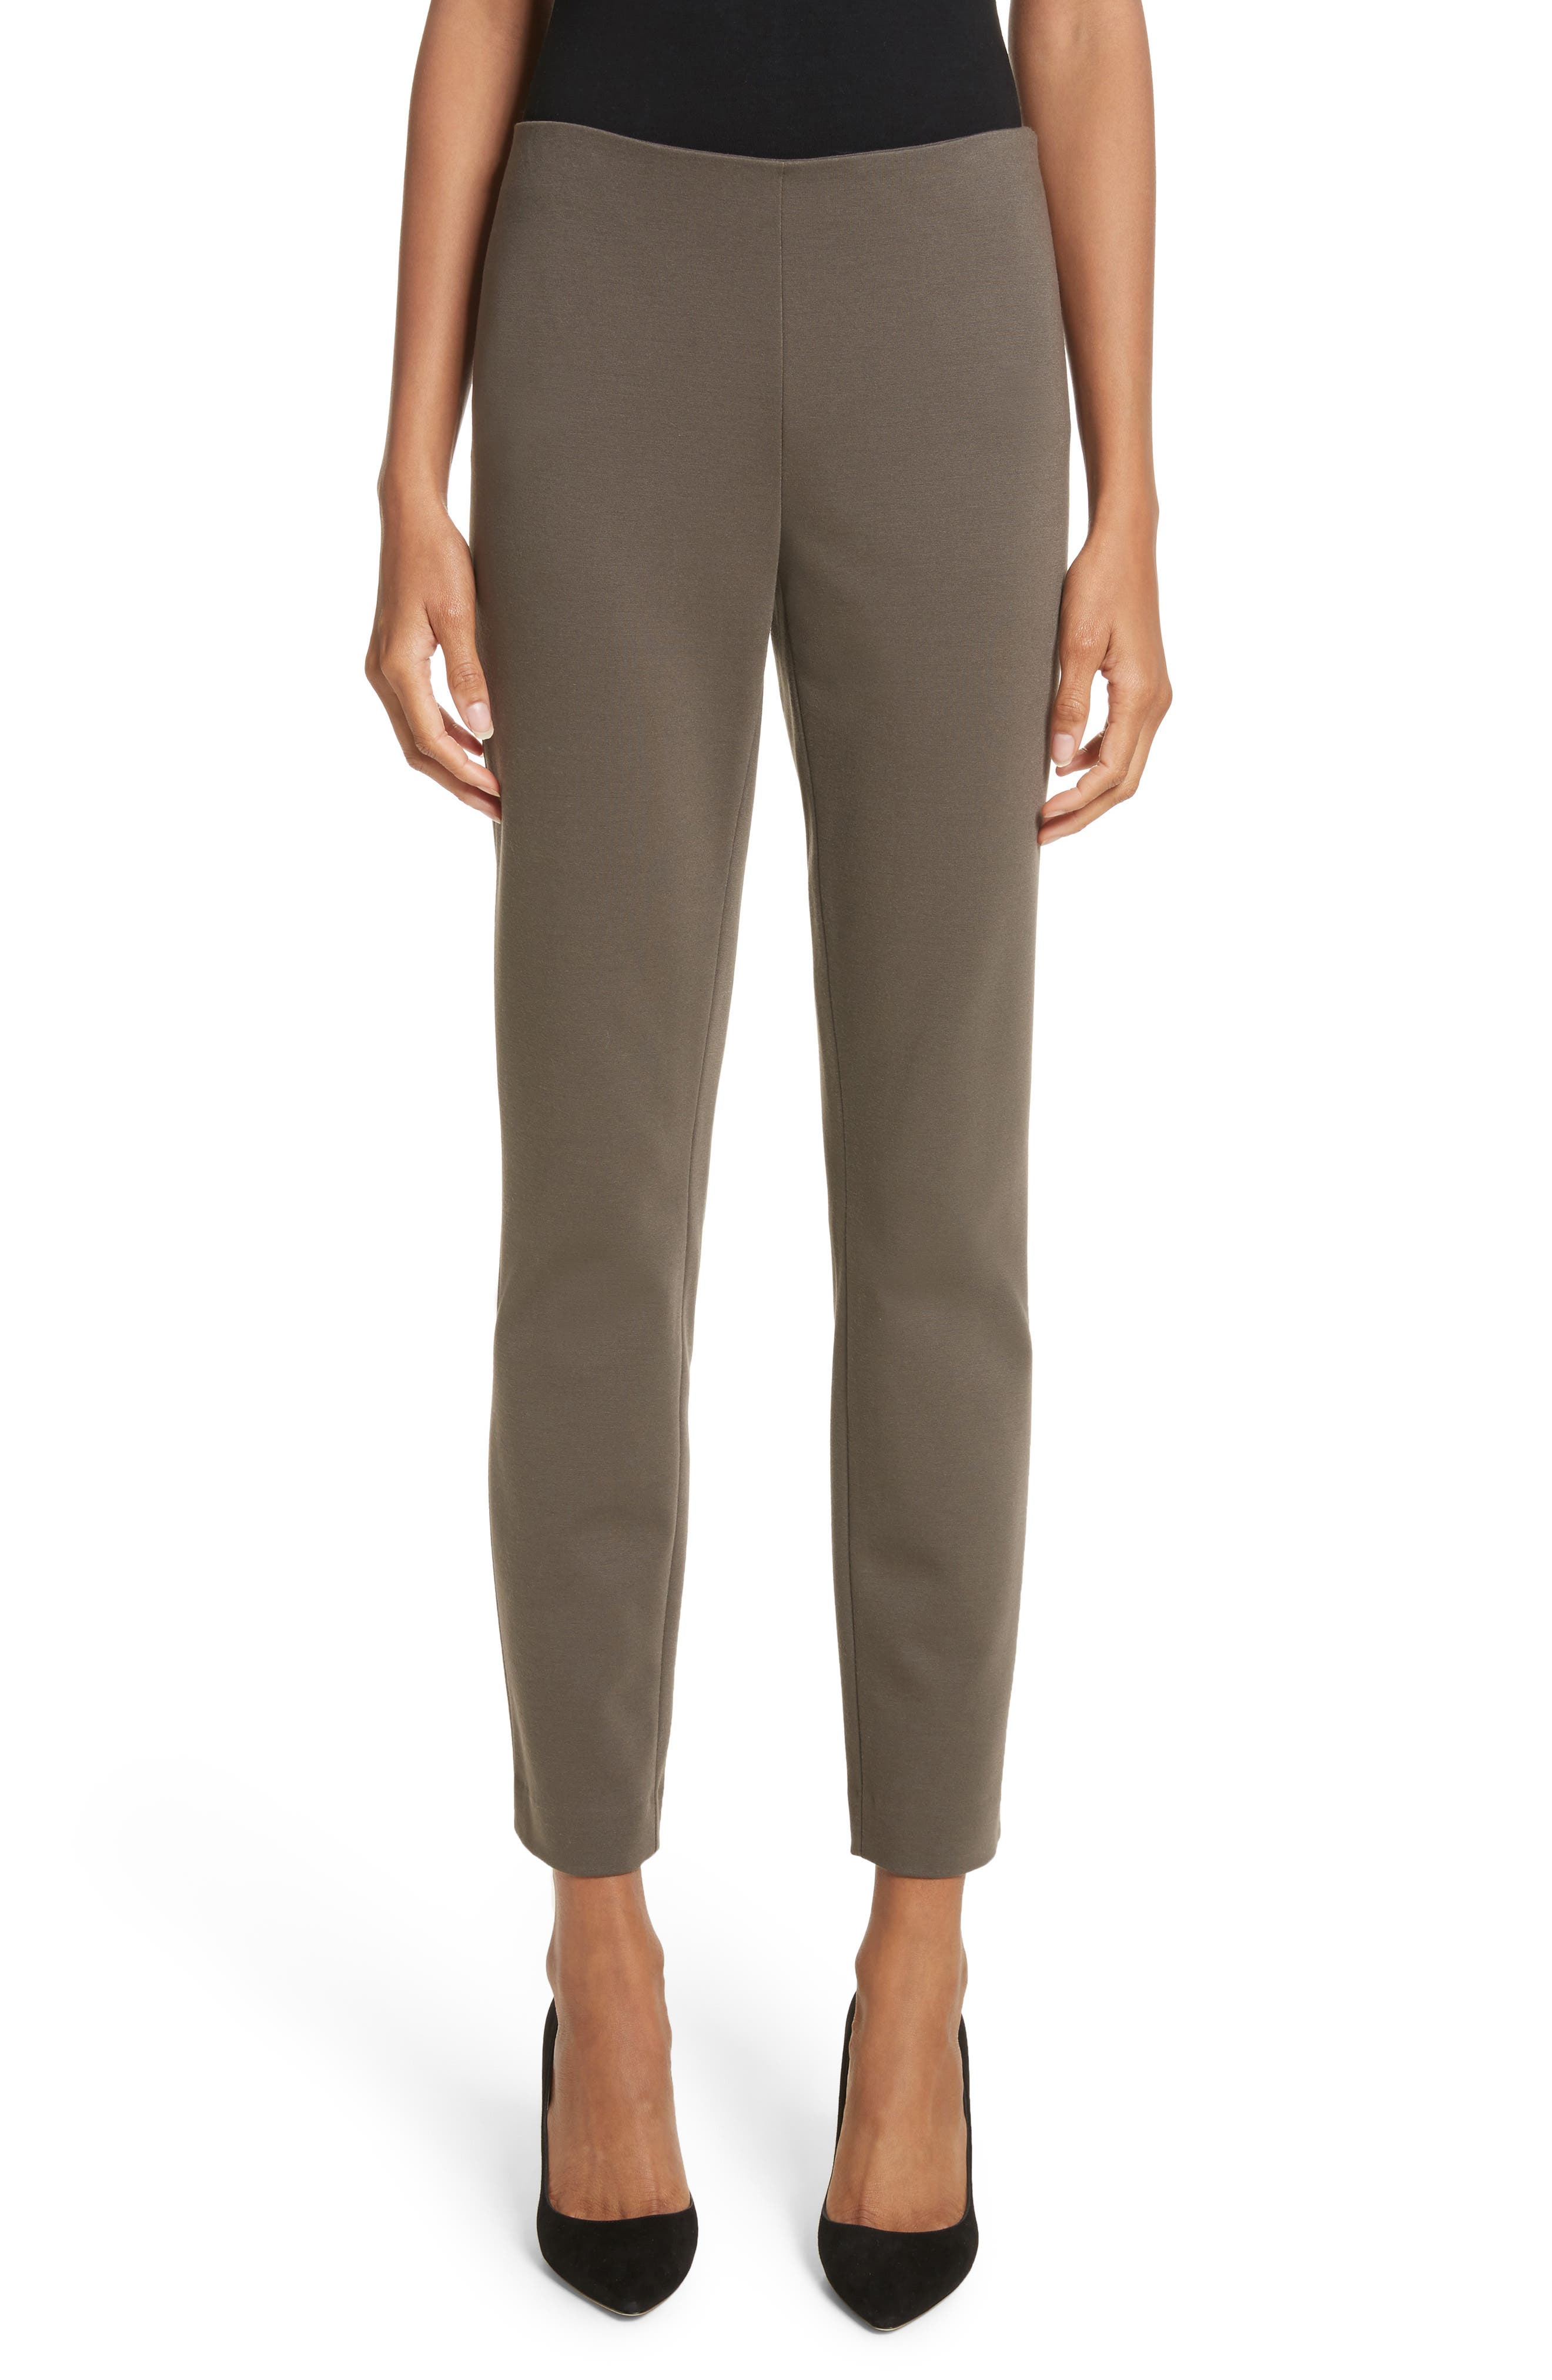 Alternate Image 1 Selected - Lafayette 148 New York Heyward Punto Milano Slim Pants (Regular & Petite)